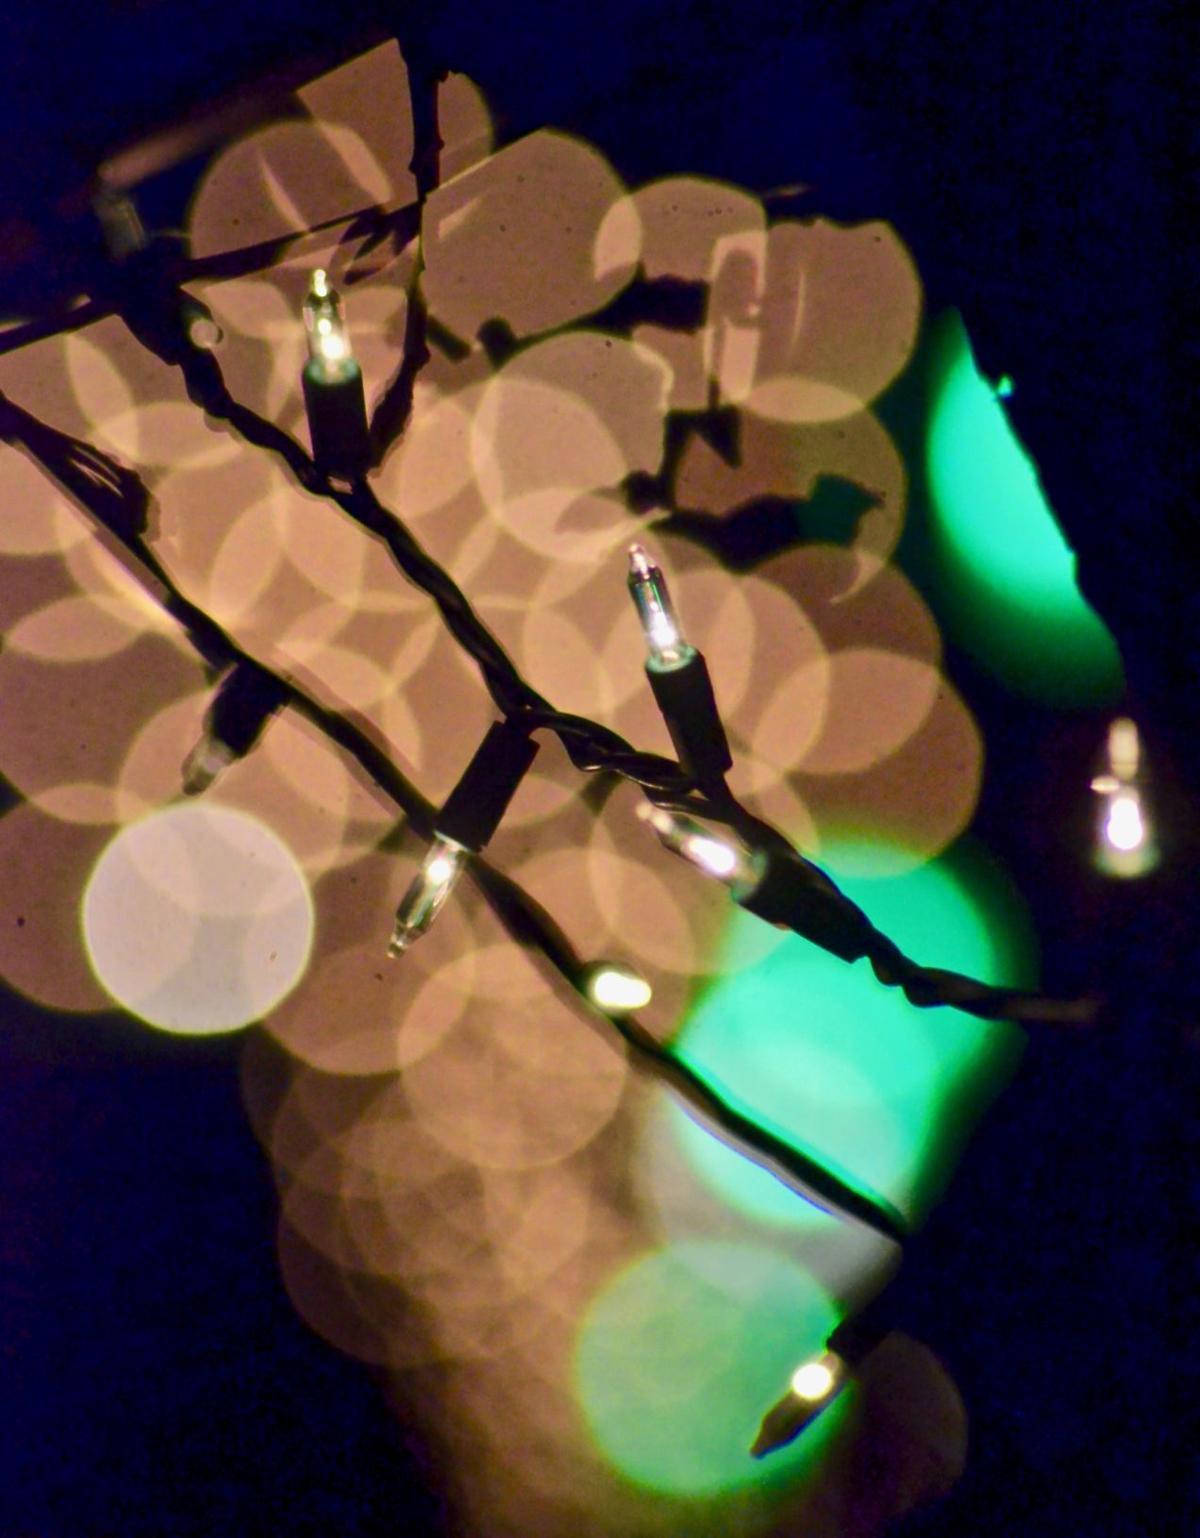 2018-12-19 wcat-chreokee lights (copy)